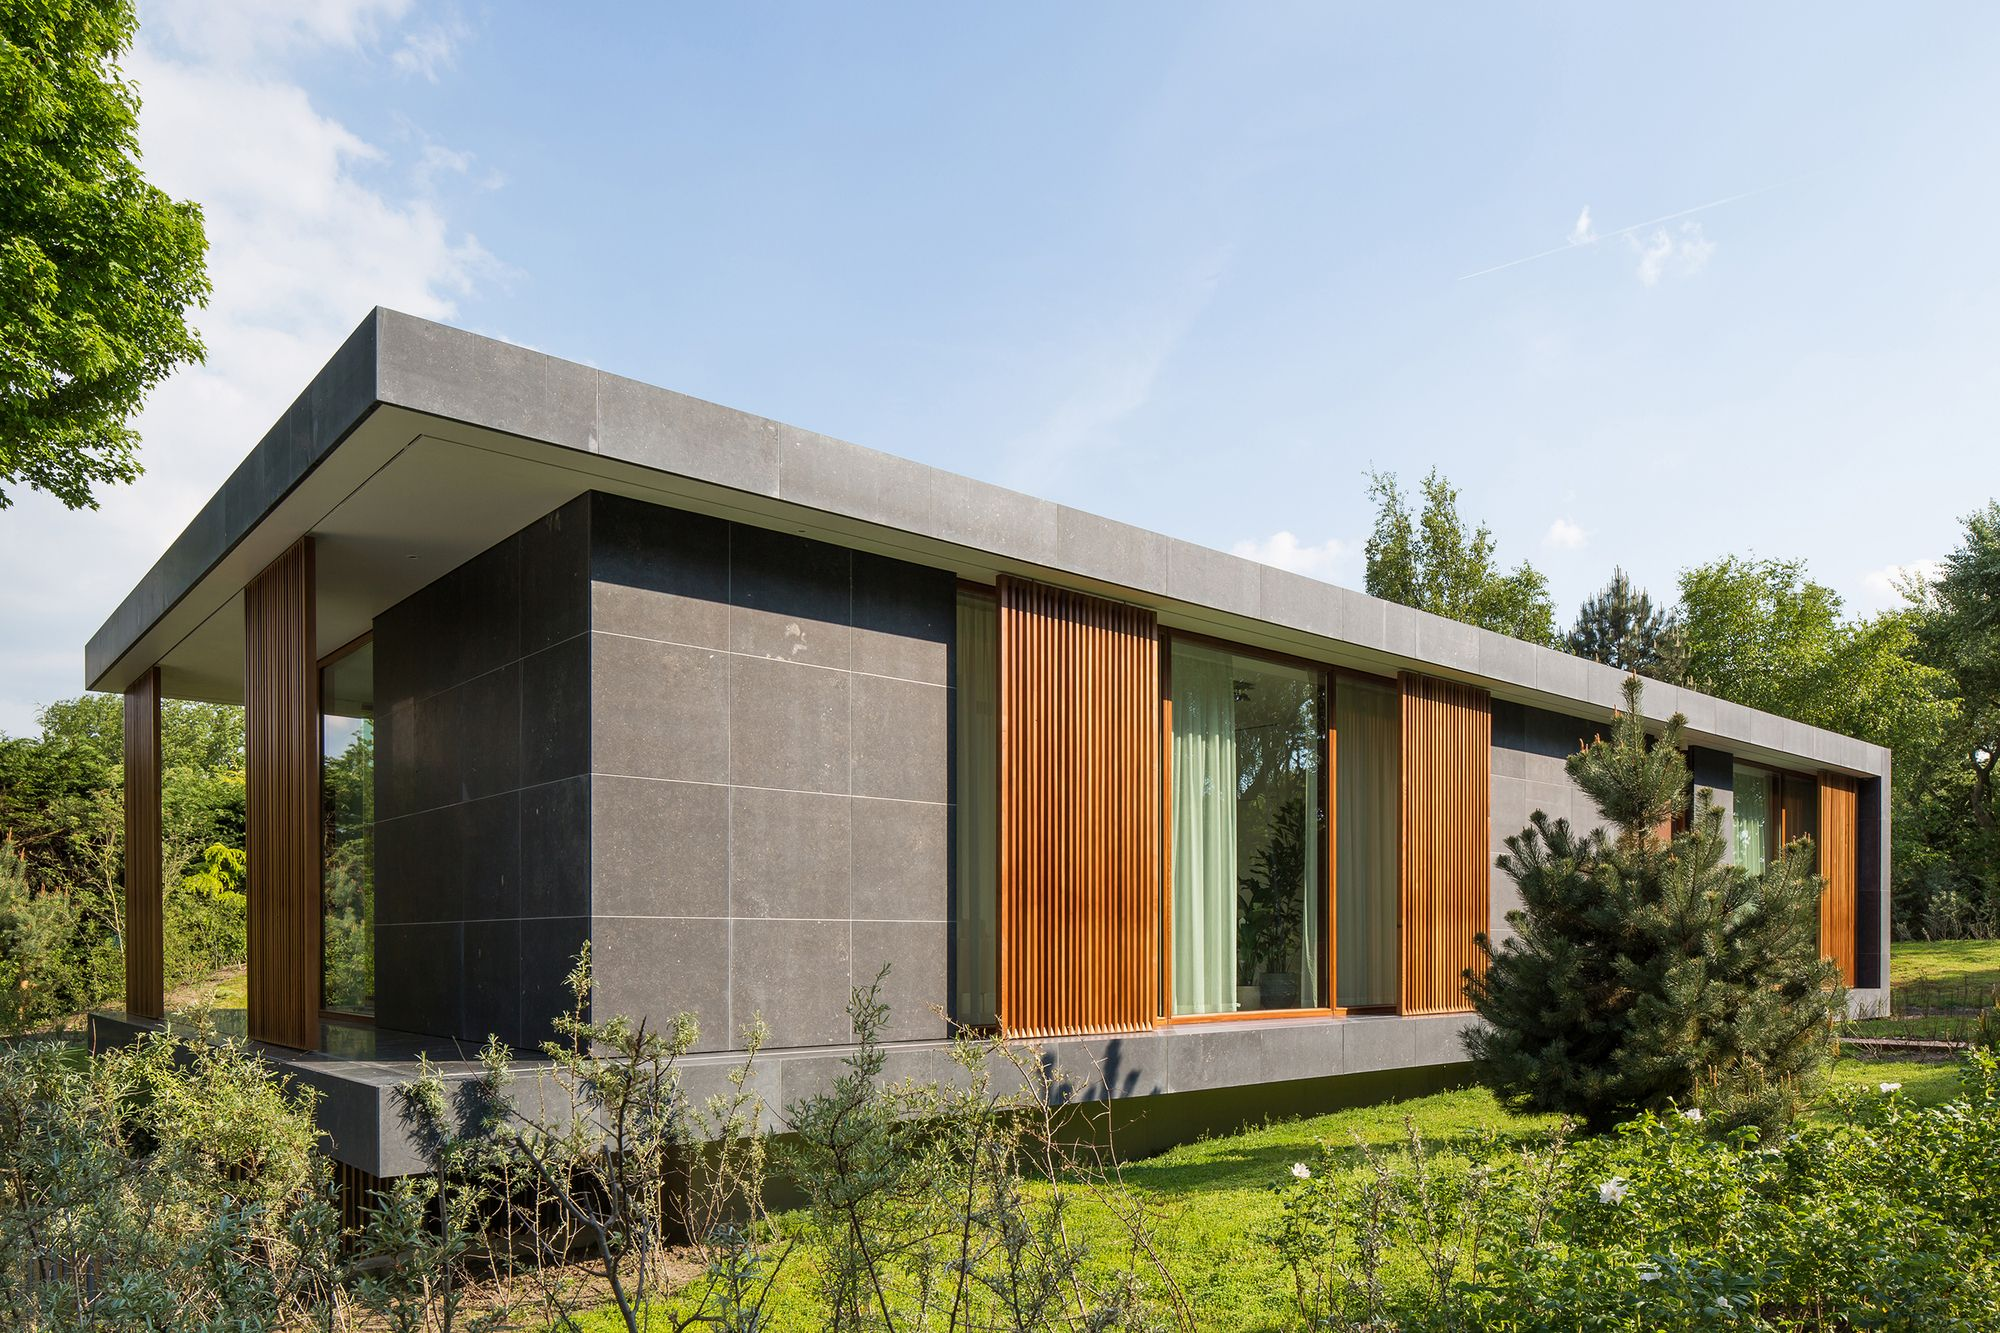 Moderne villa in de duinen moderne huizen in 2019 for Moderne villa architectuur